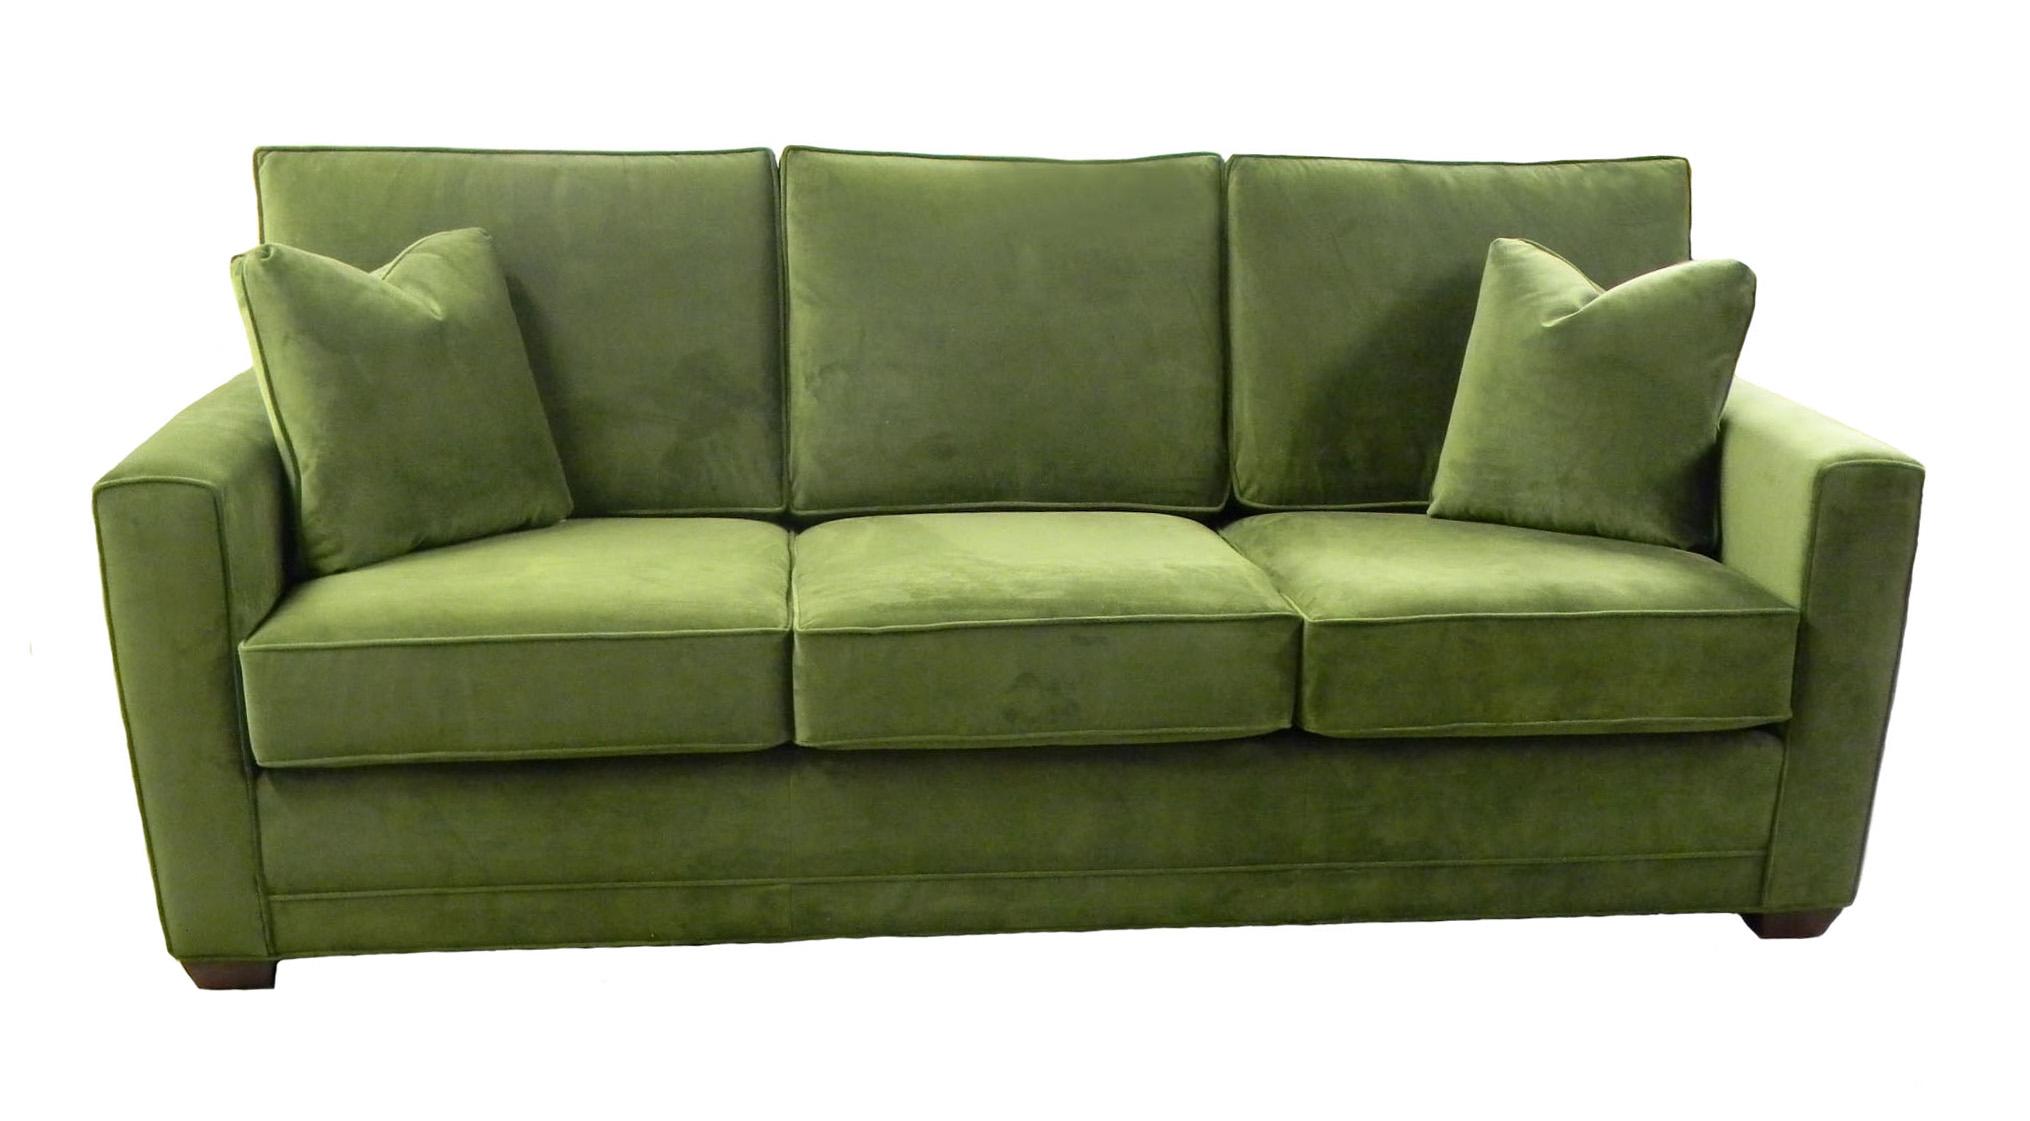 Henley Sofa Couch Carolina Chair Made USA NC free shipping